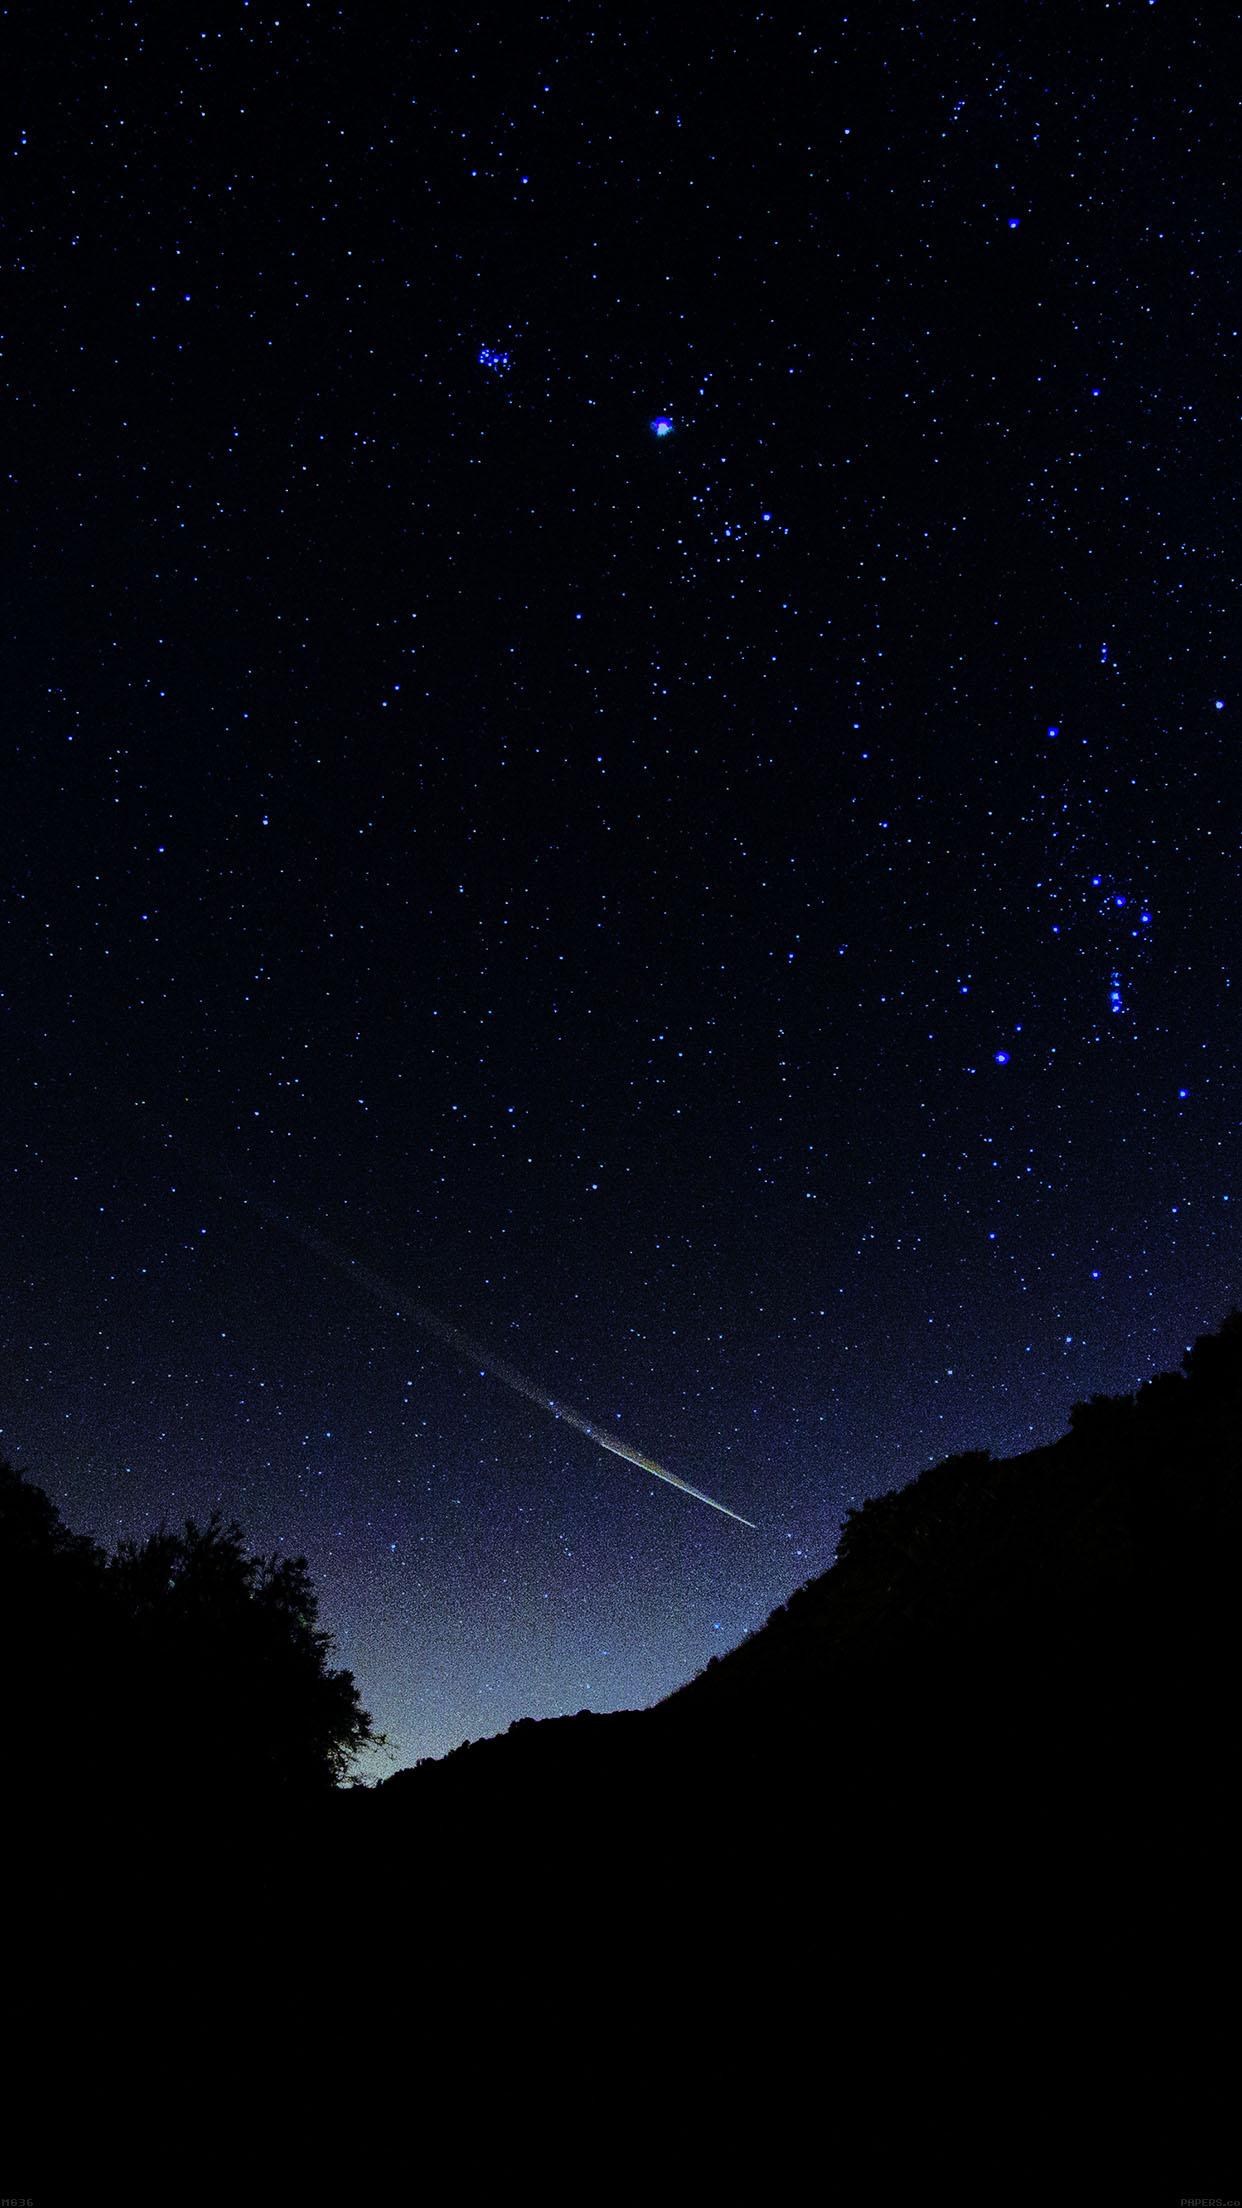 Falling Star Wallpaper Hd Mg36 Astronomy Space Dark Sky Night Beautiful Falling Star